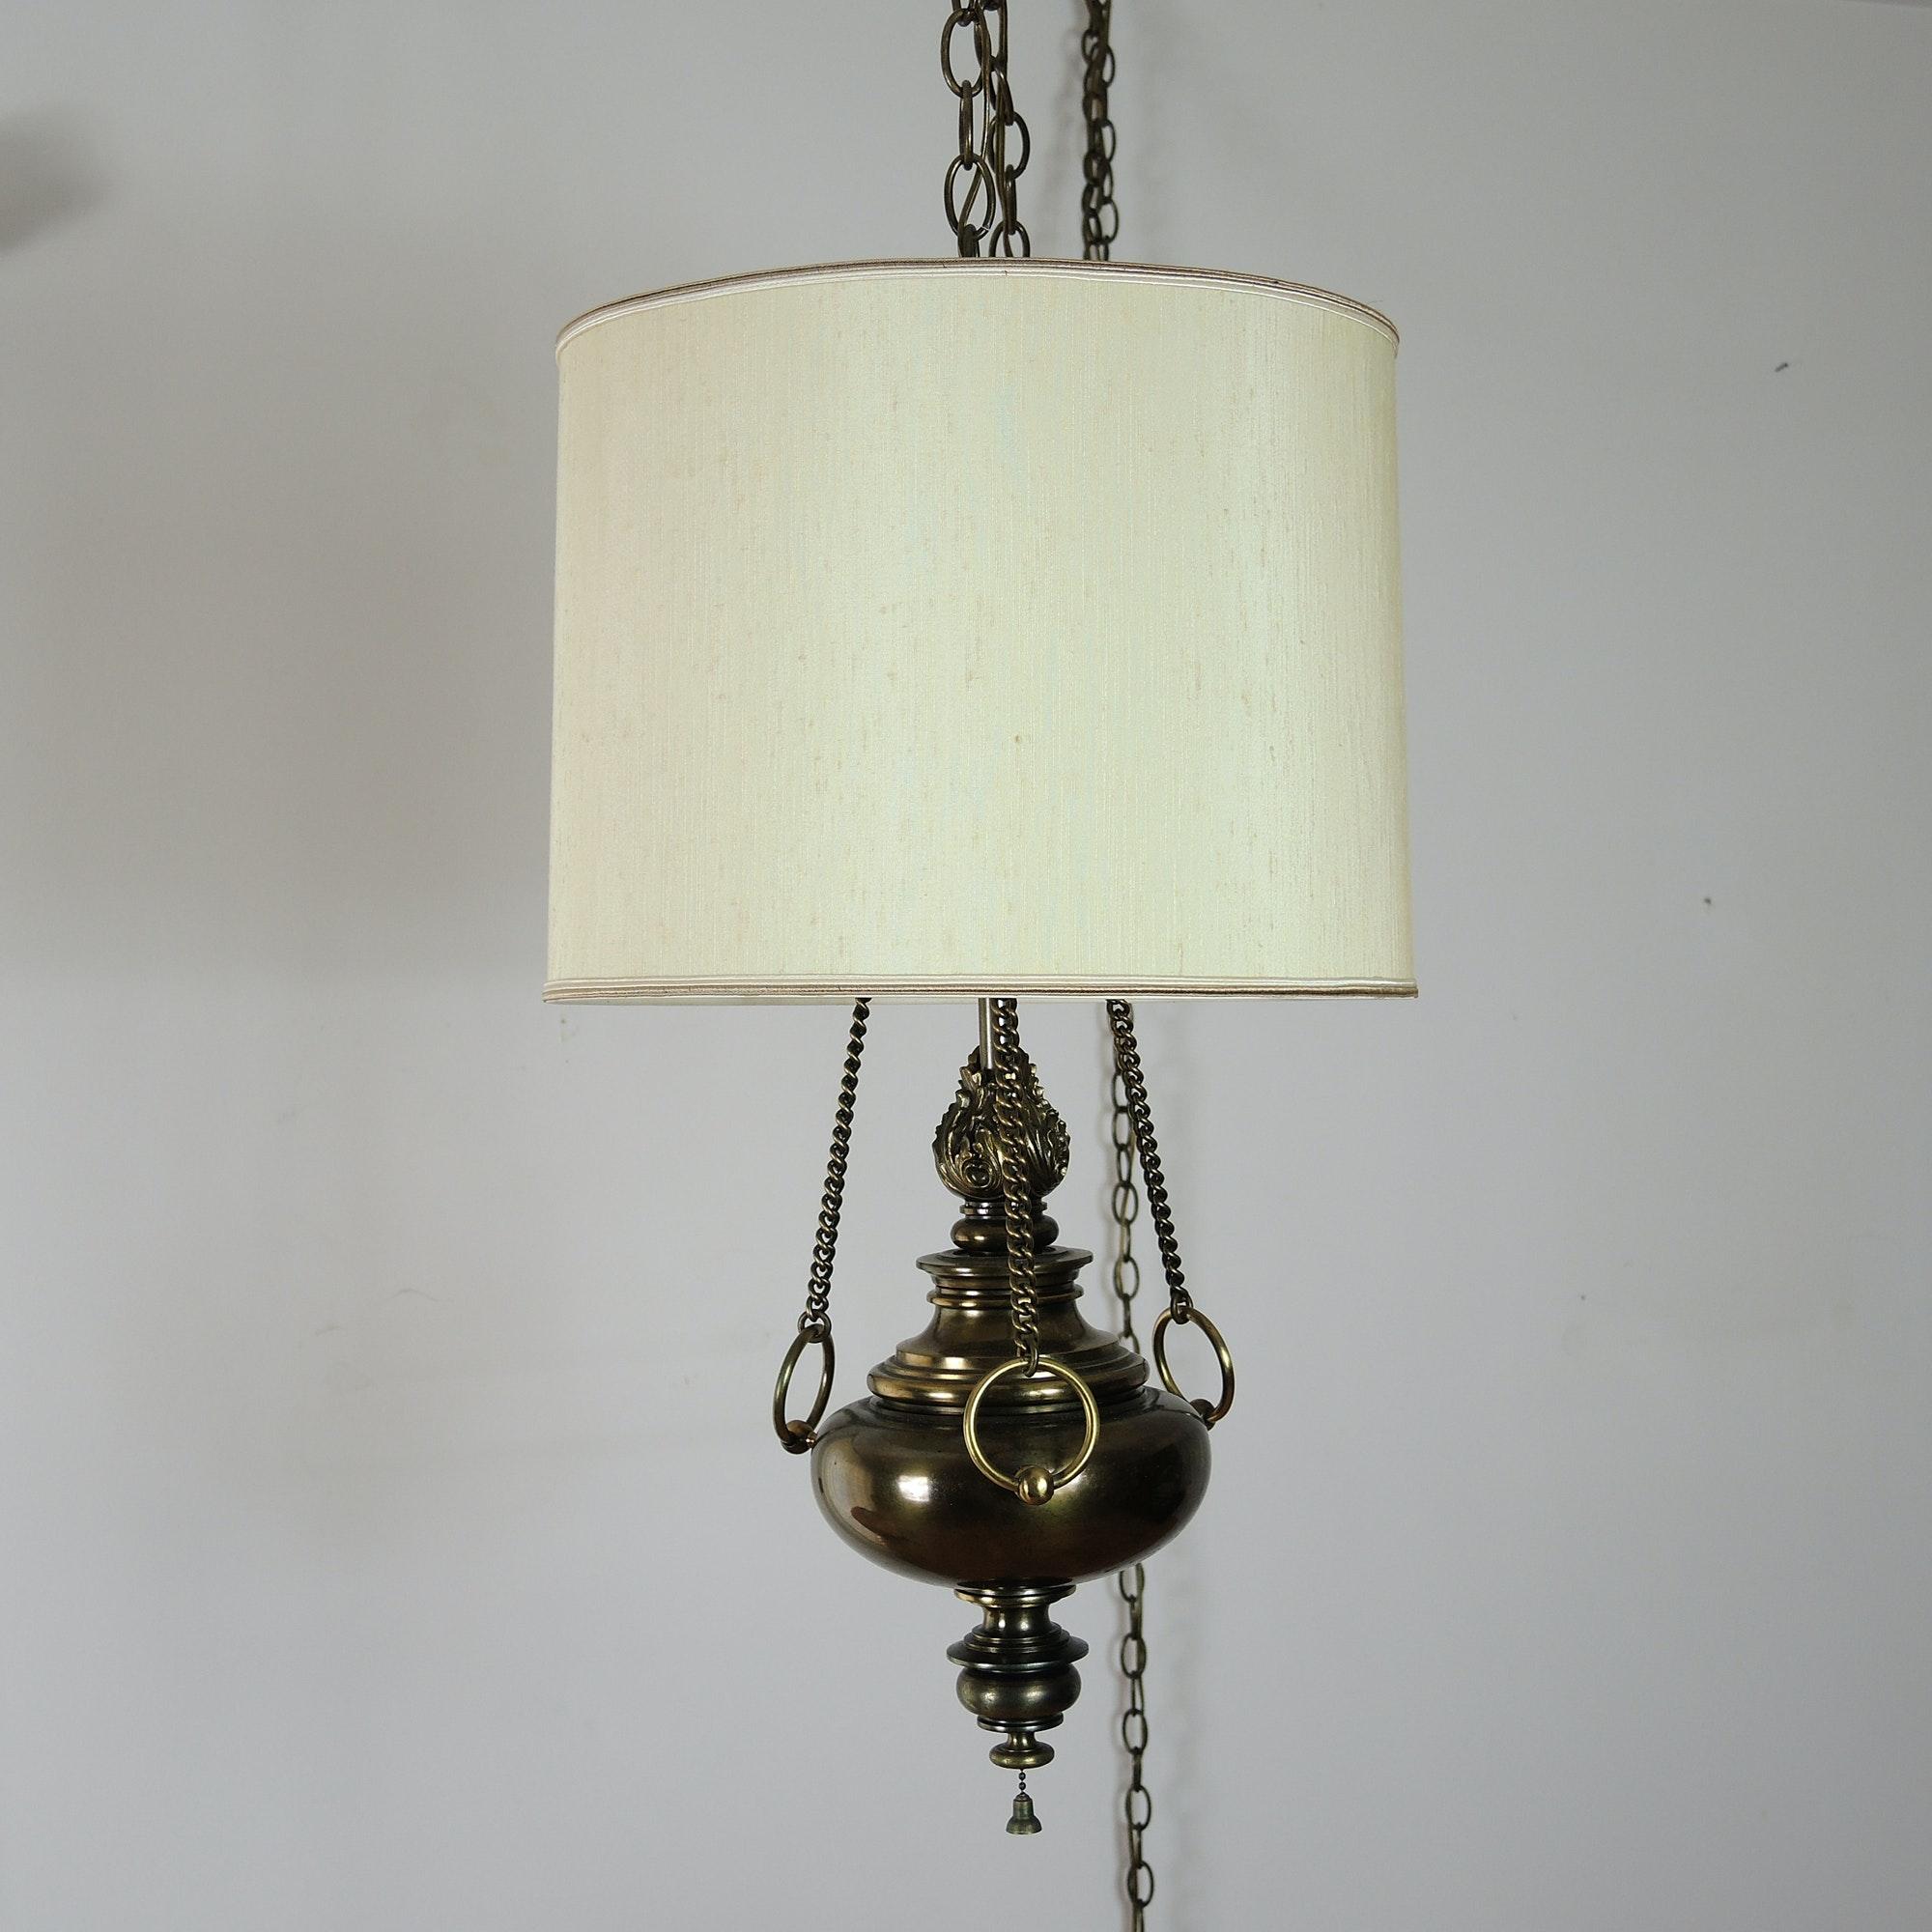 Vintage Hanging Pendant Swag Lamp